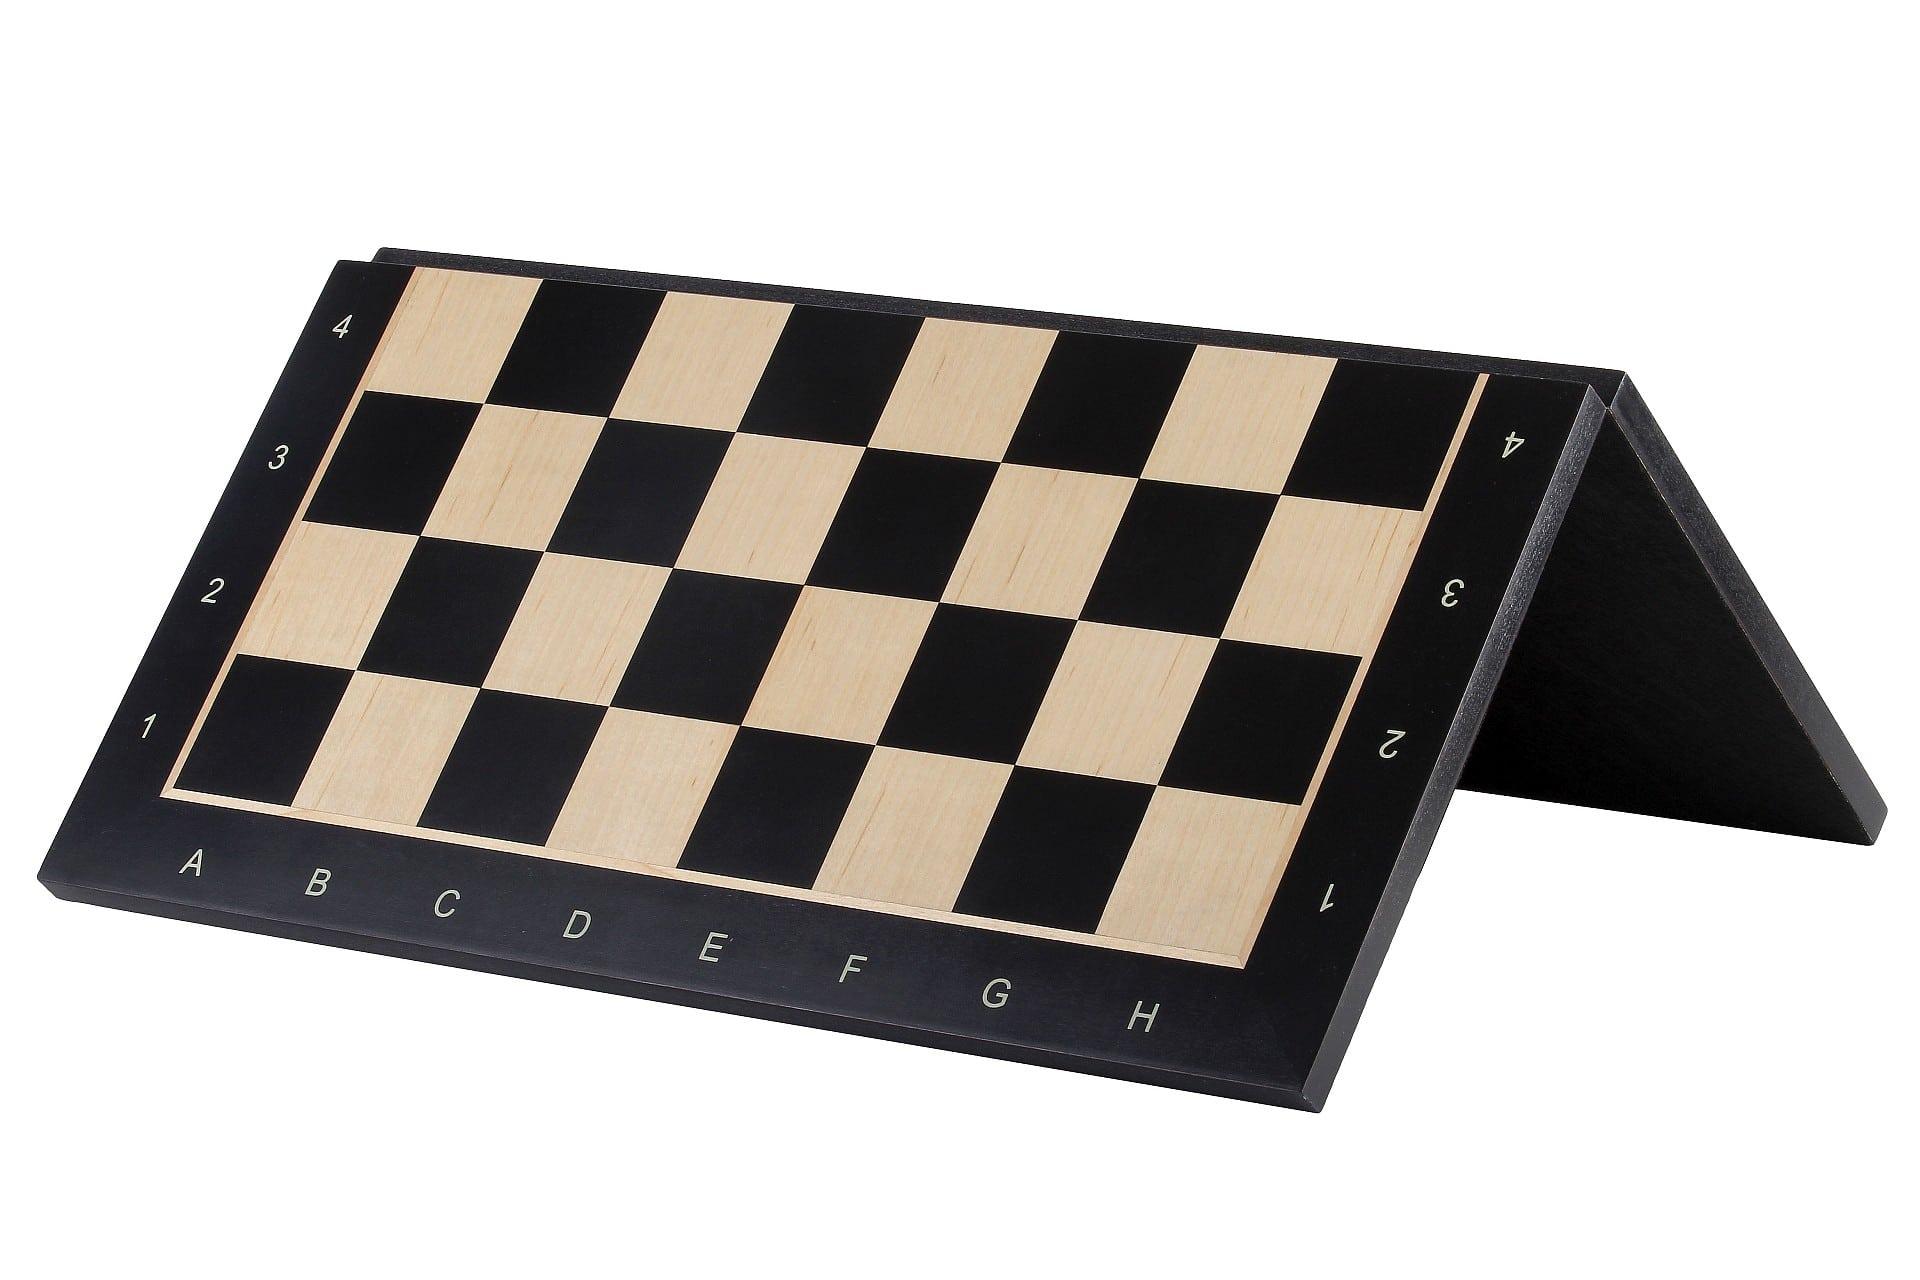 Black Folding ChessBoard